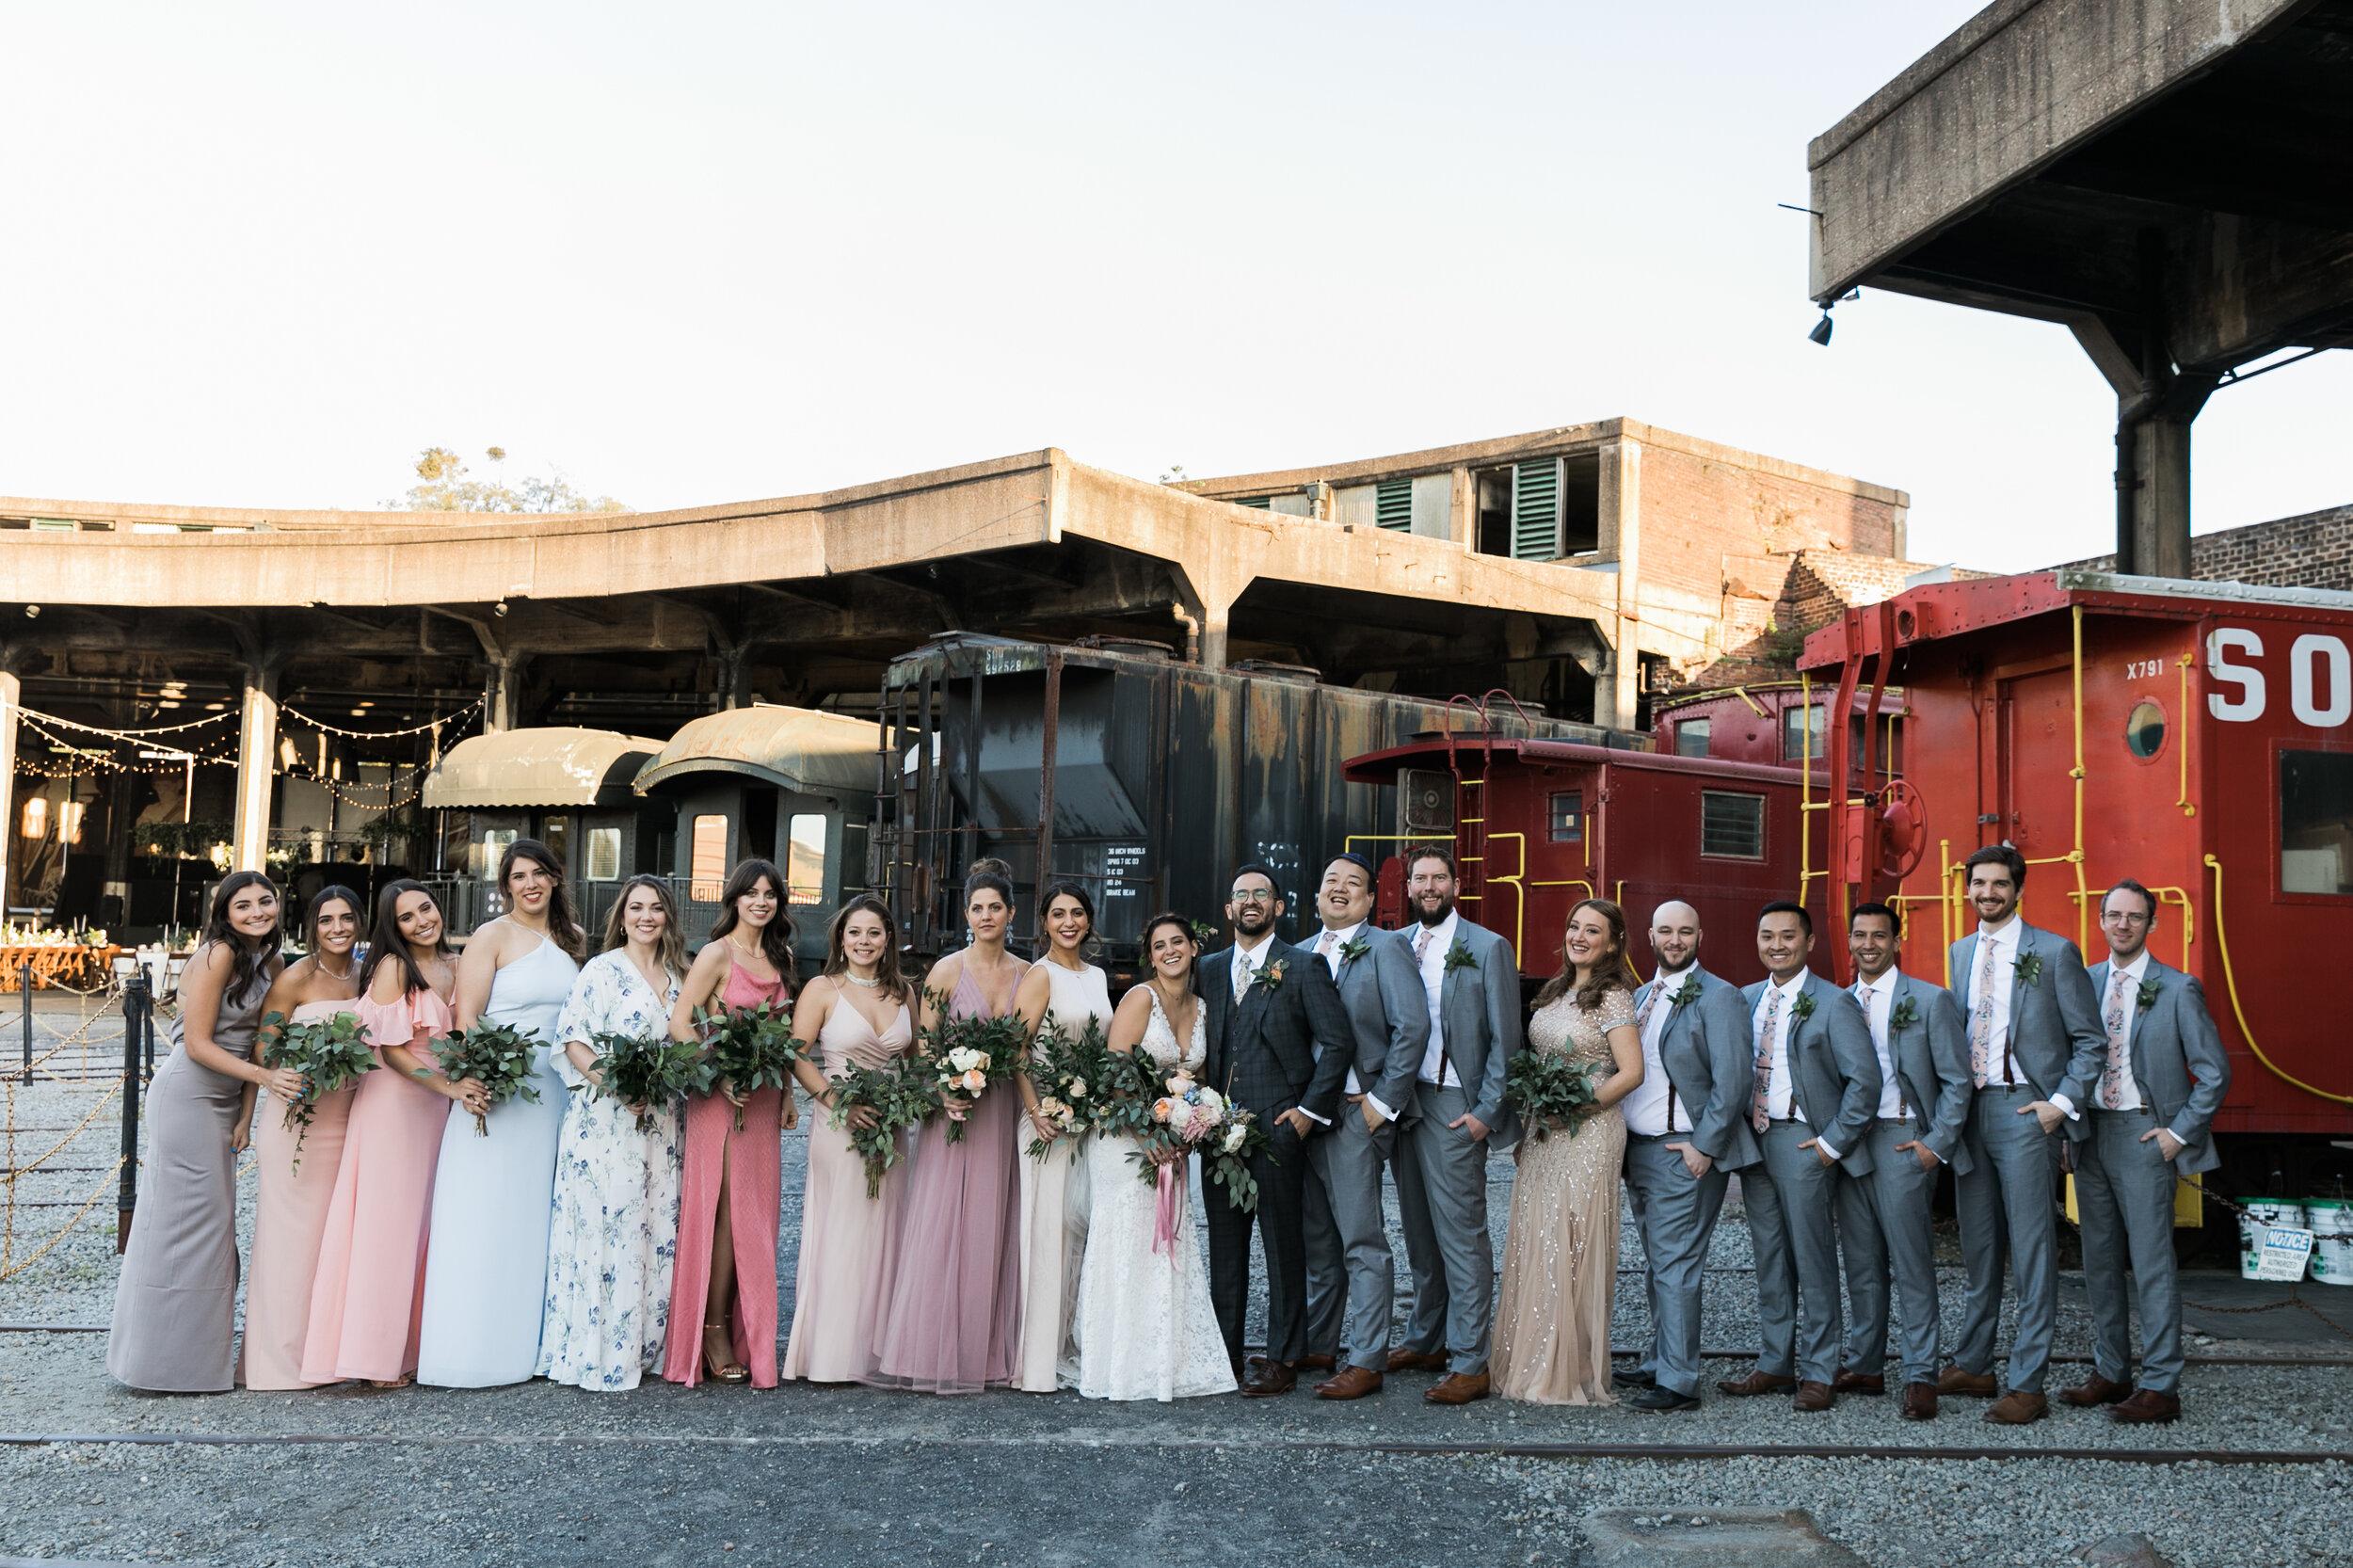 ivory-and-beau-blog-weddings-ivory-and-beau-couple-dominique-and-andres-savannah-florist-wedding-planning-savannah-bridal-boutique-wedding-flowers-KIP_WEBERWEDDING_RAILROADMUSEUM-1232.JPG